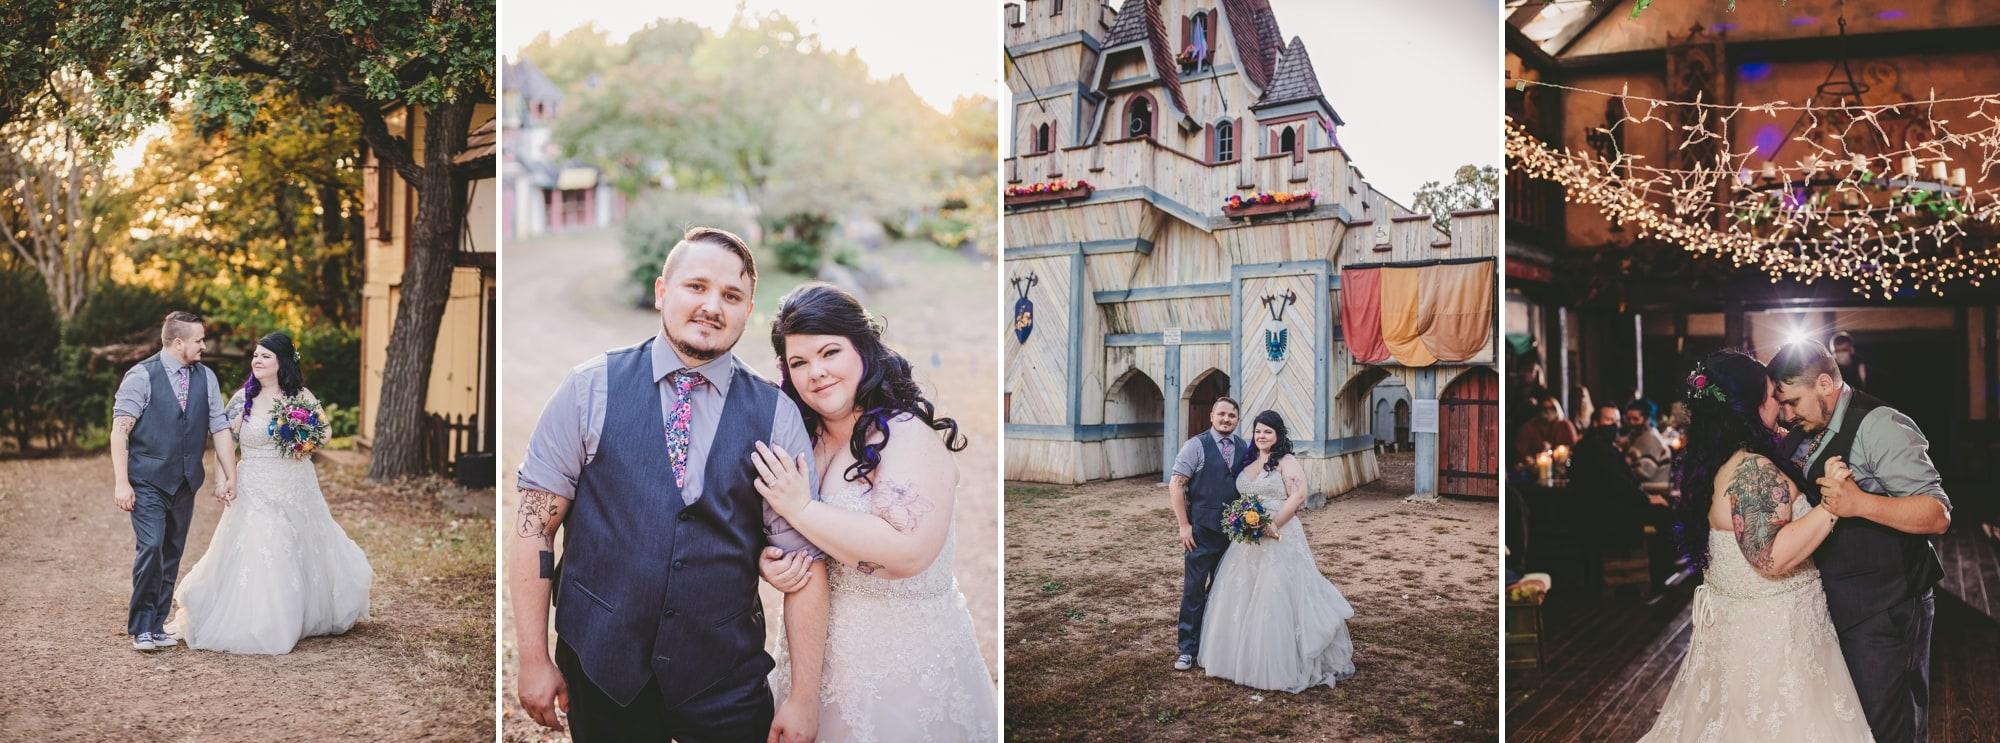 Gallery of Taran and Joe's wedding photos at the Renaissance Festival in Shakopee, Minnesota.